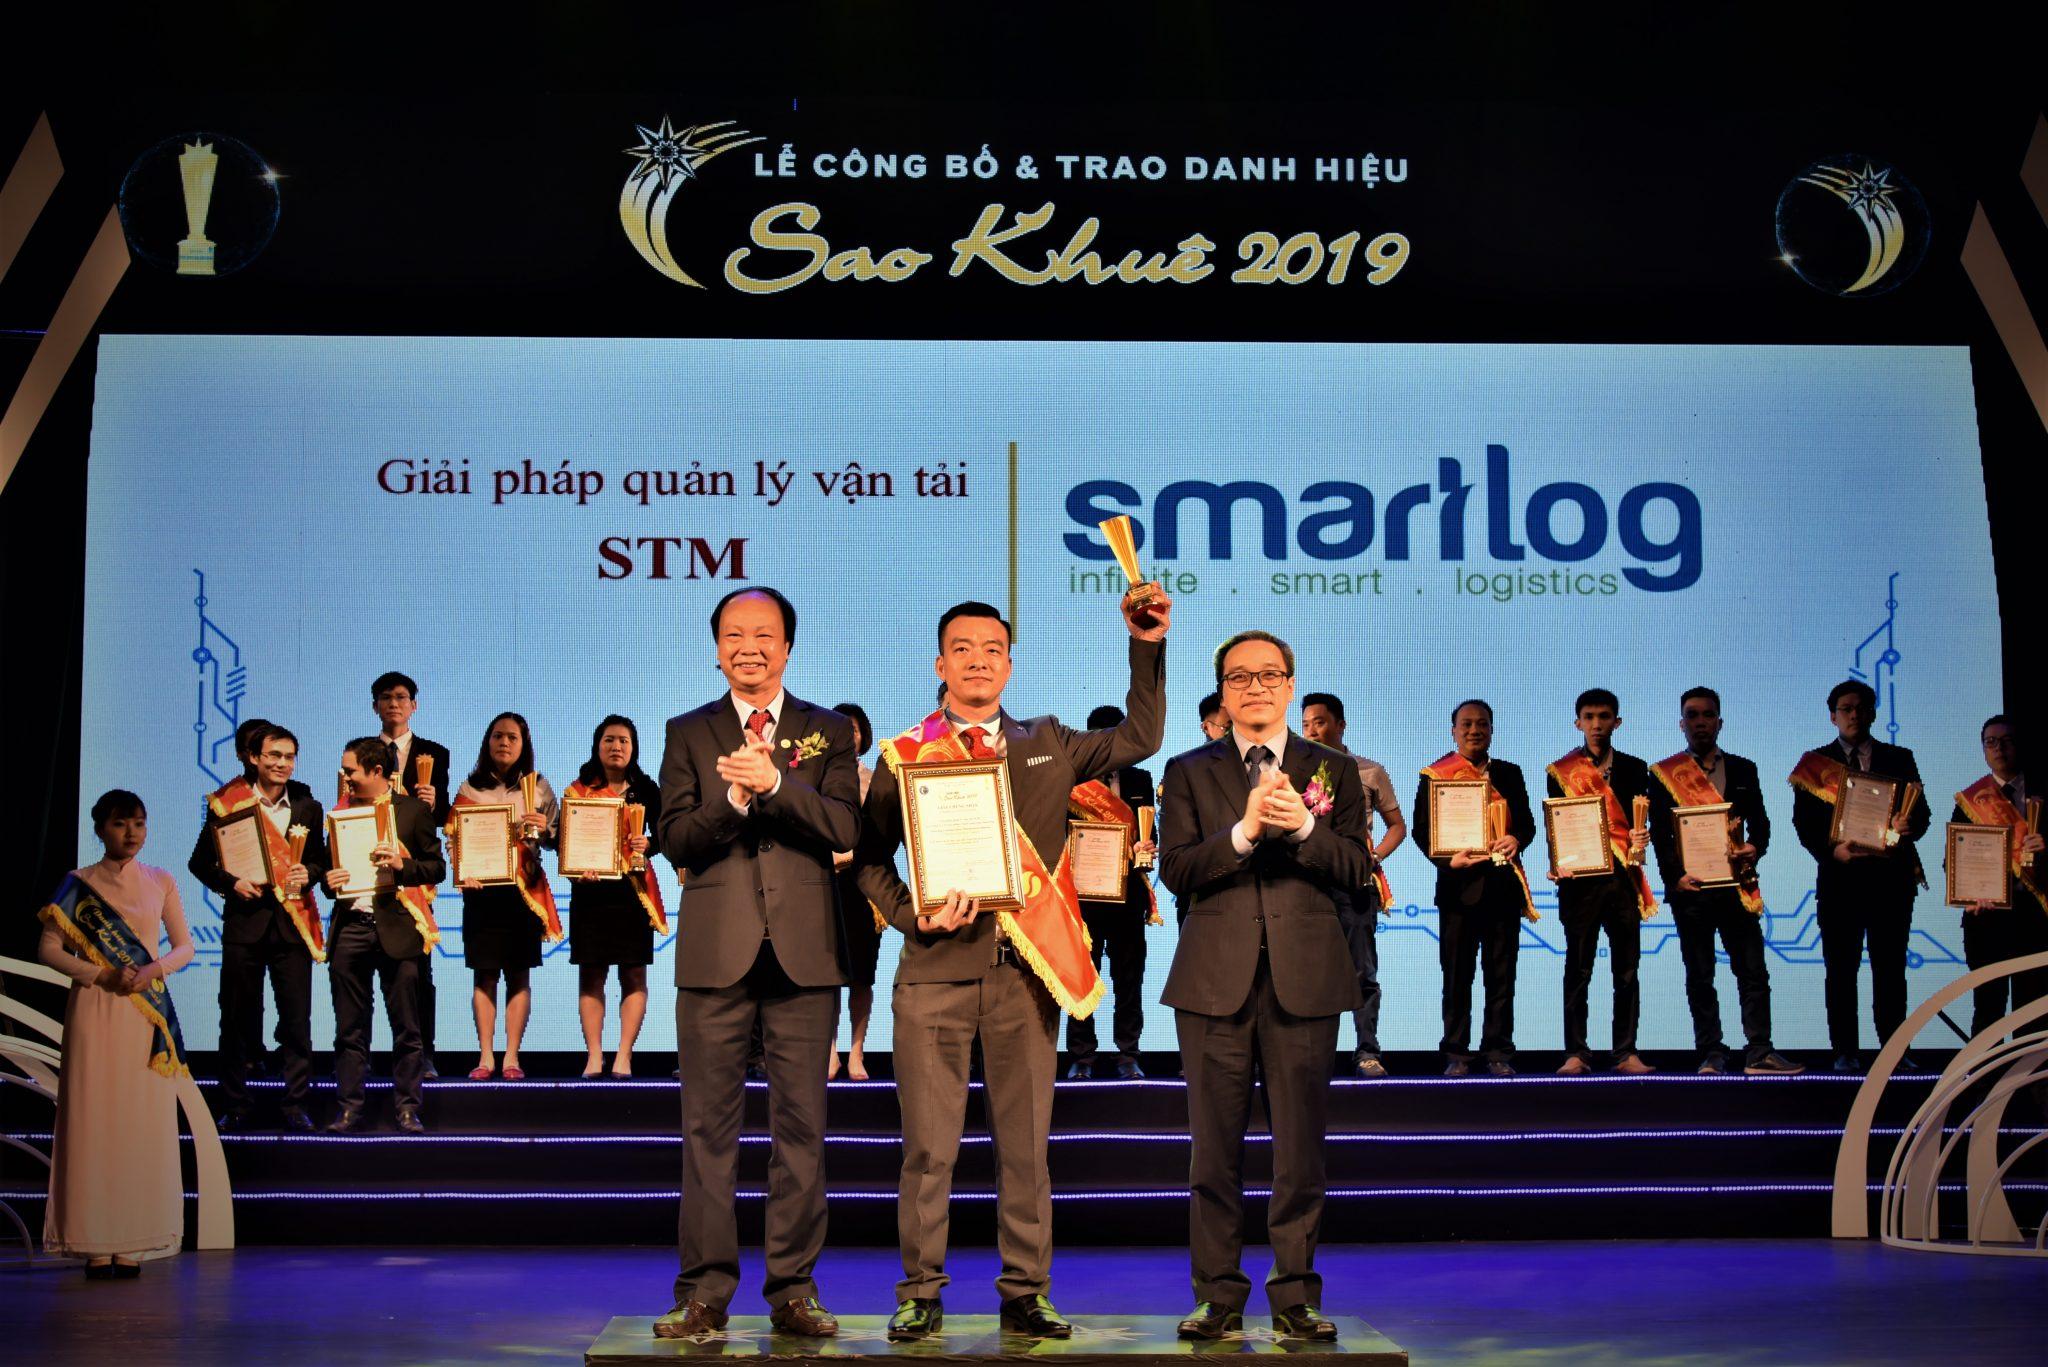 Mr. Nguyen Duy Hong, VP, received the award